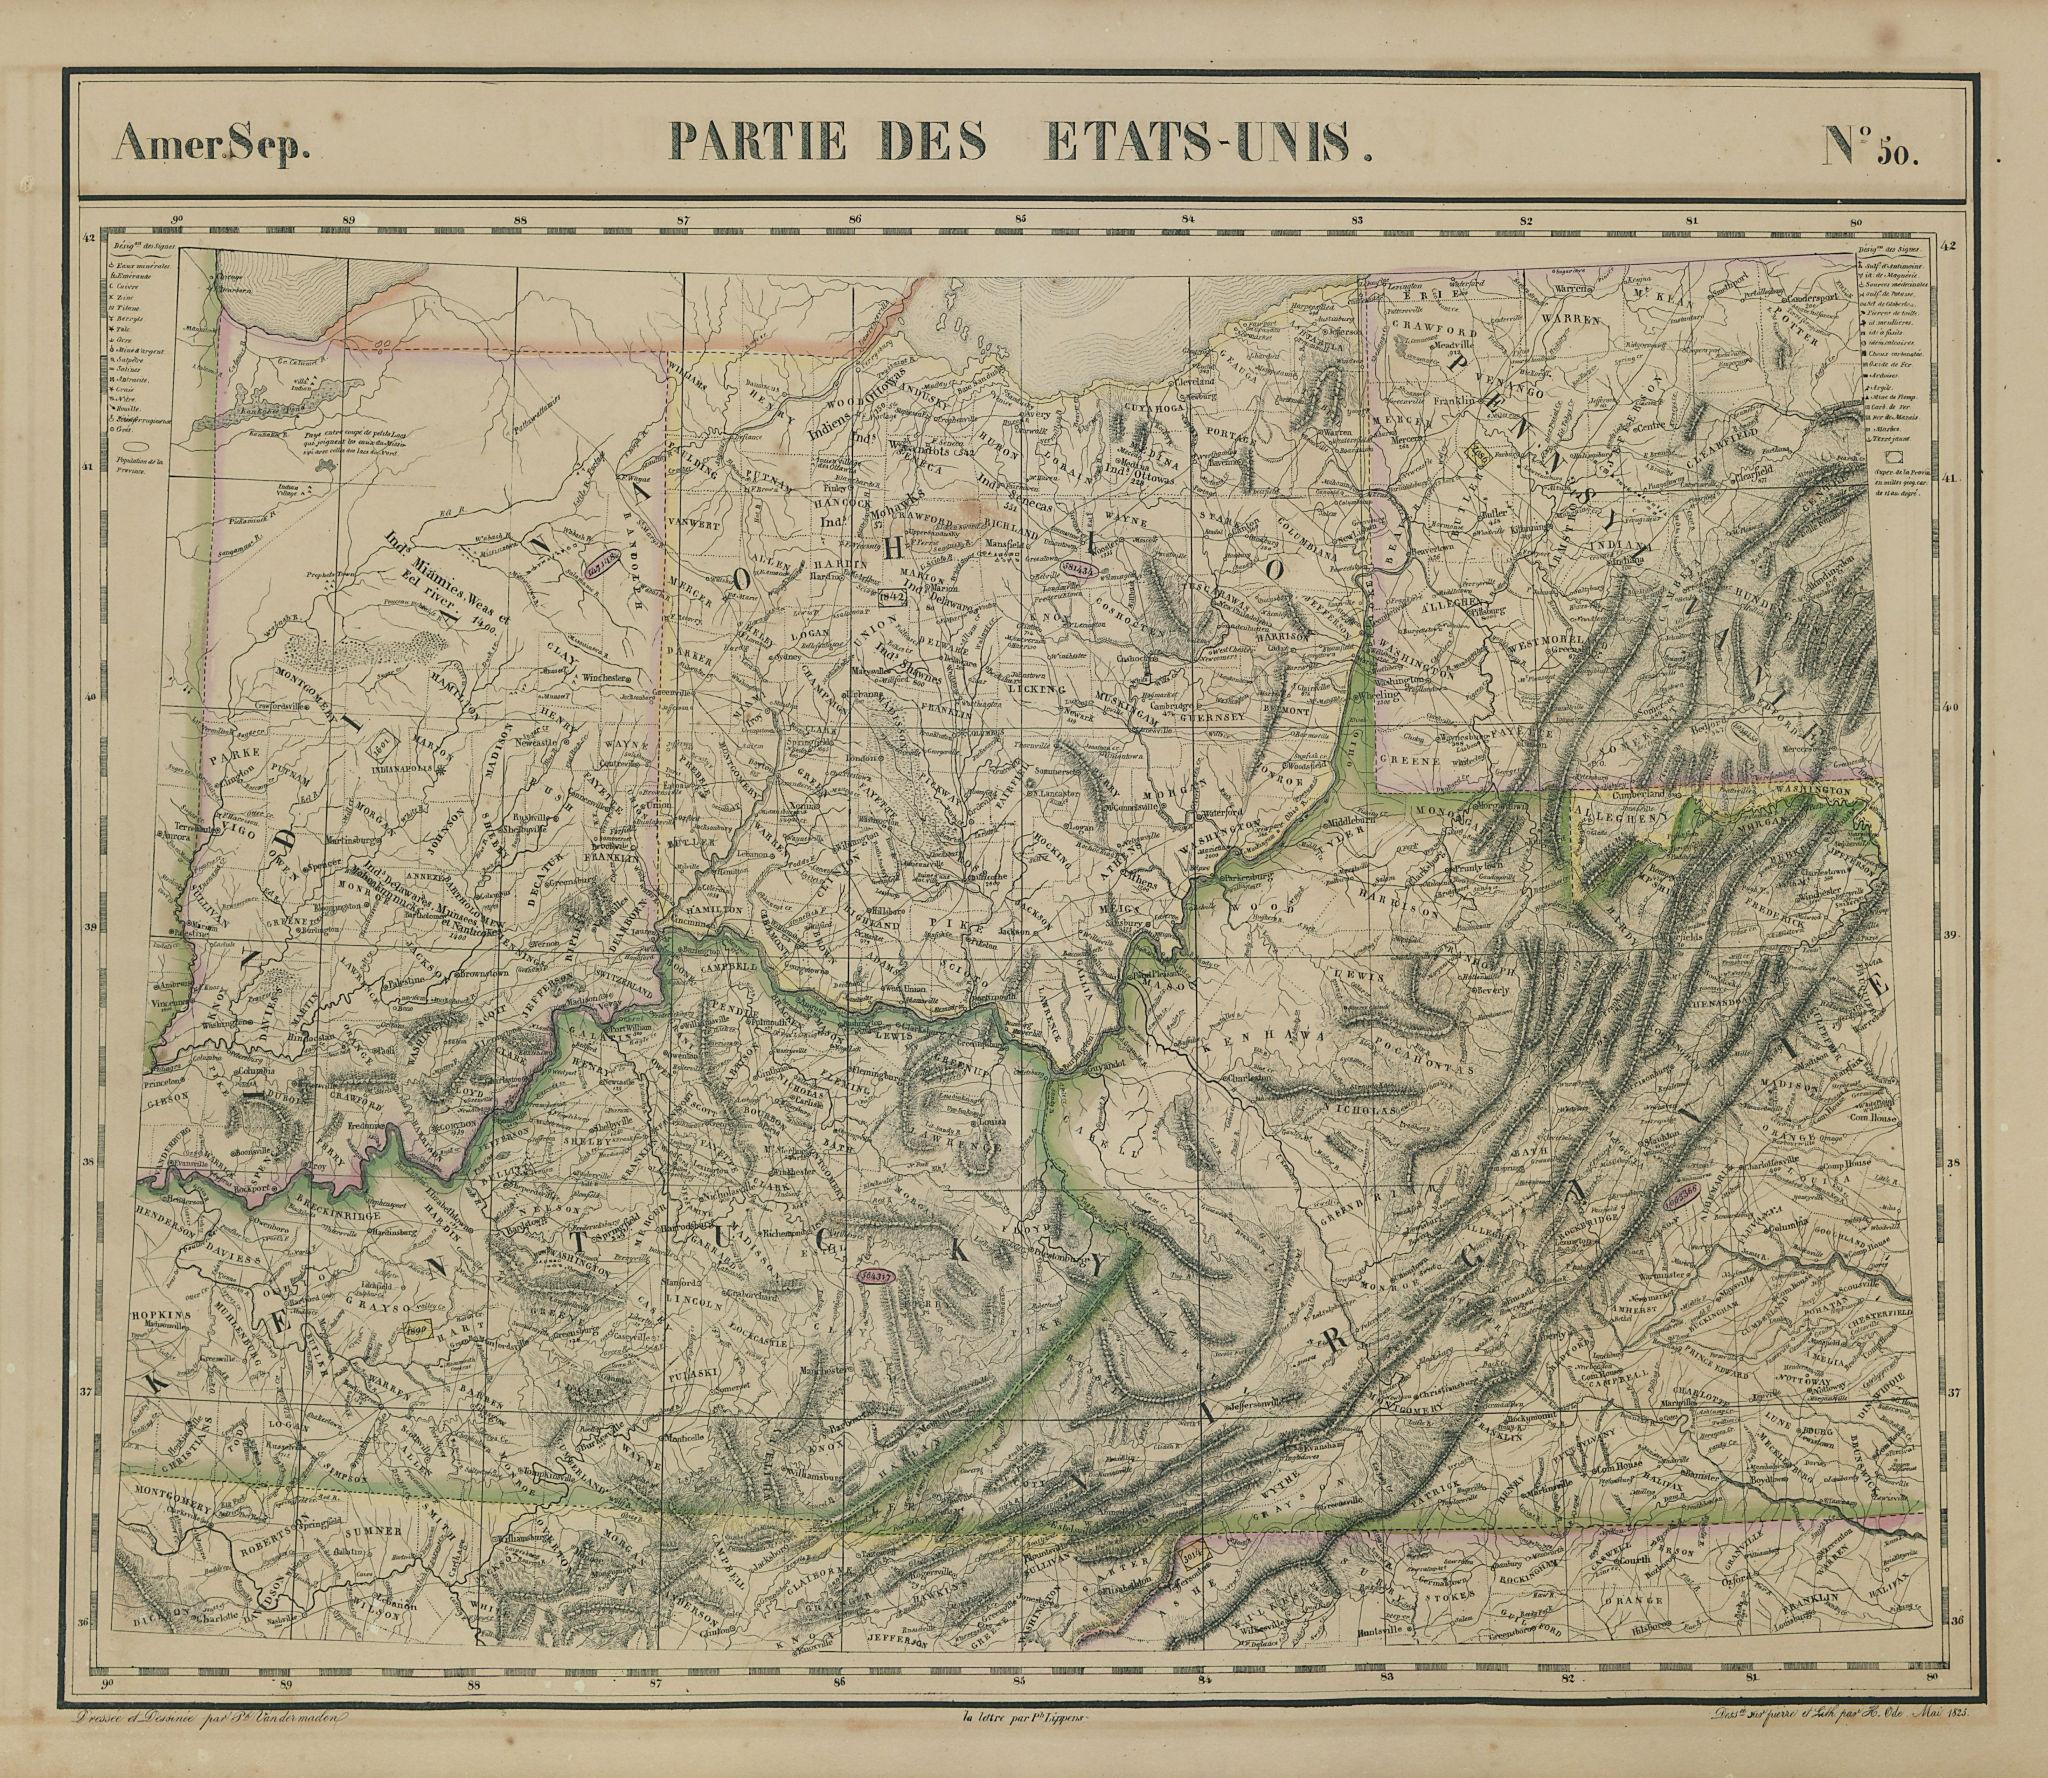 Amér Sep Parties des États-Unis #50 Ohio KY WV VA IN PA. VANDERMAELEN 1827 map